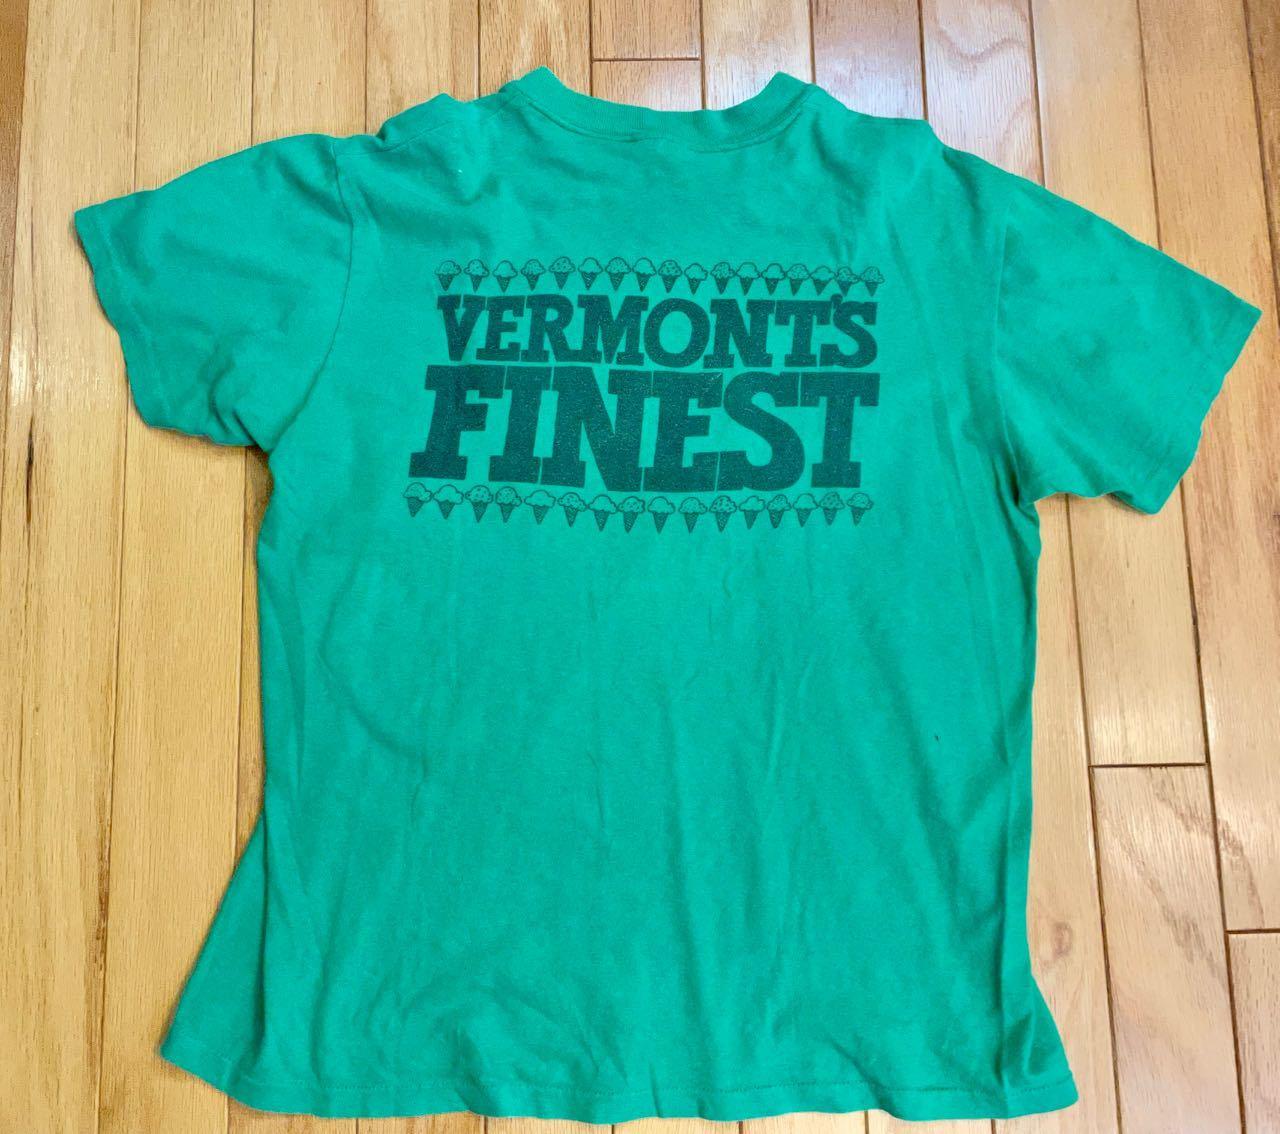 7月22日(木)入荷! 80s  BEN&JERRY\'S ICE CREAM Tシャツ!_c0144020_20345665.jpg